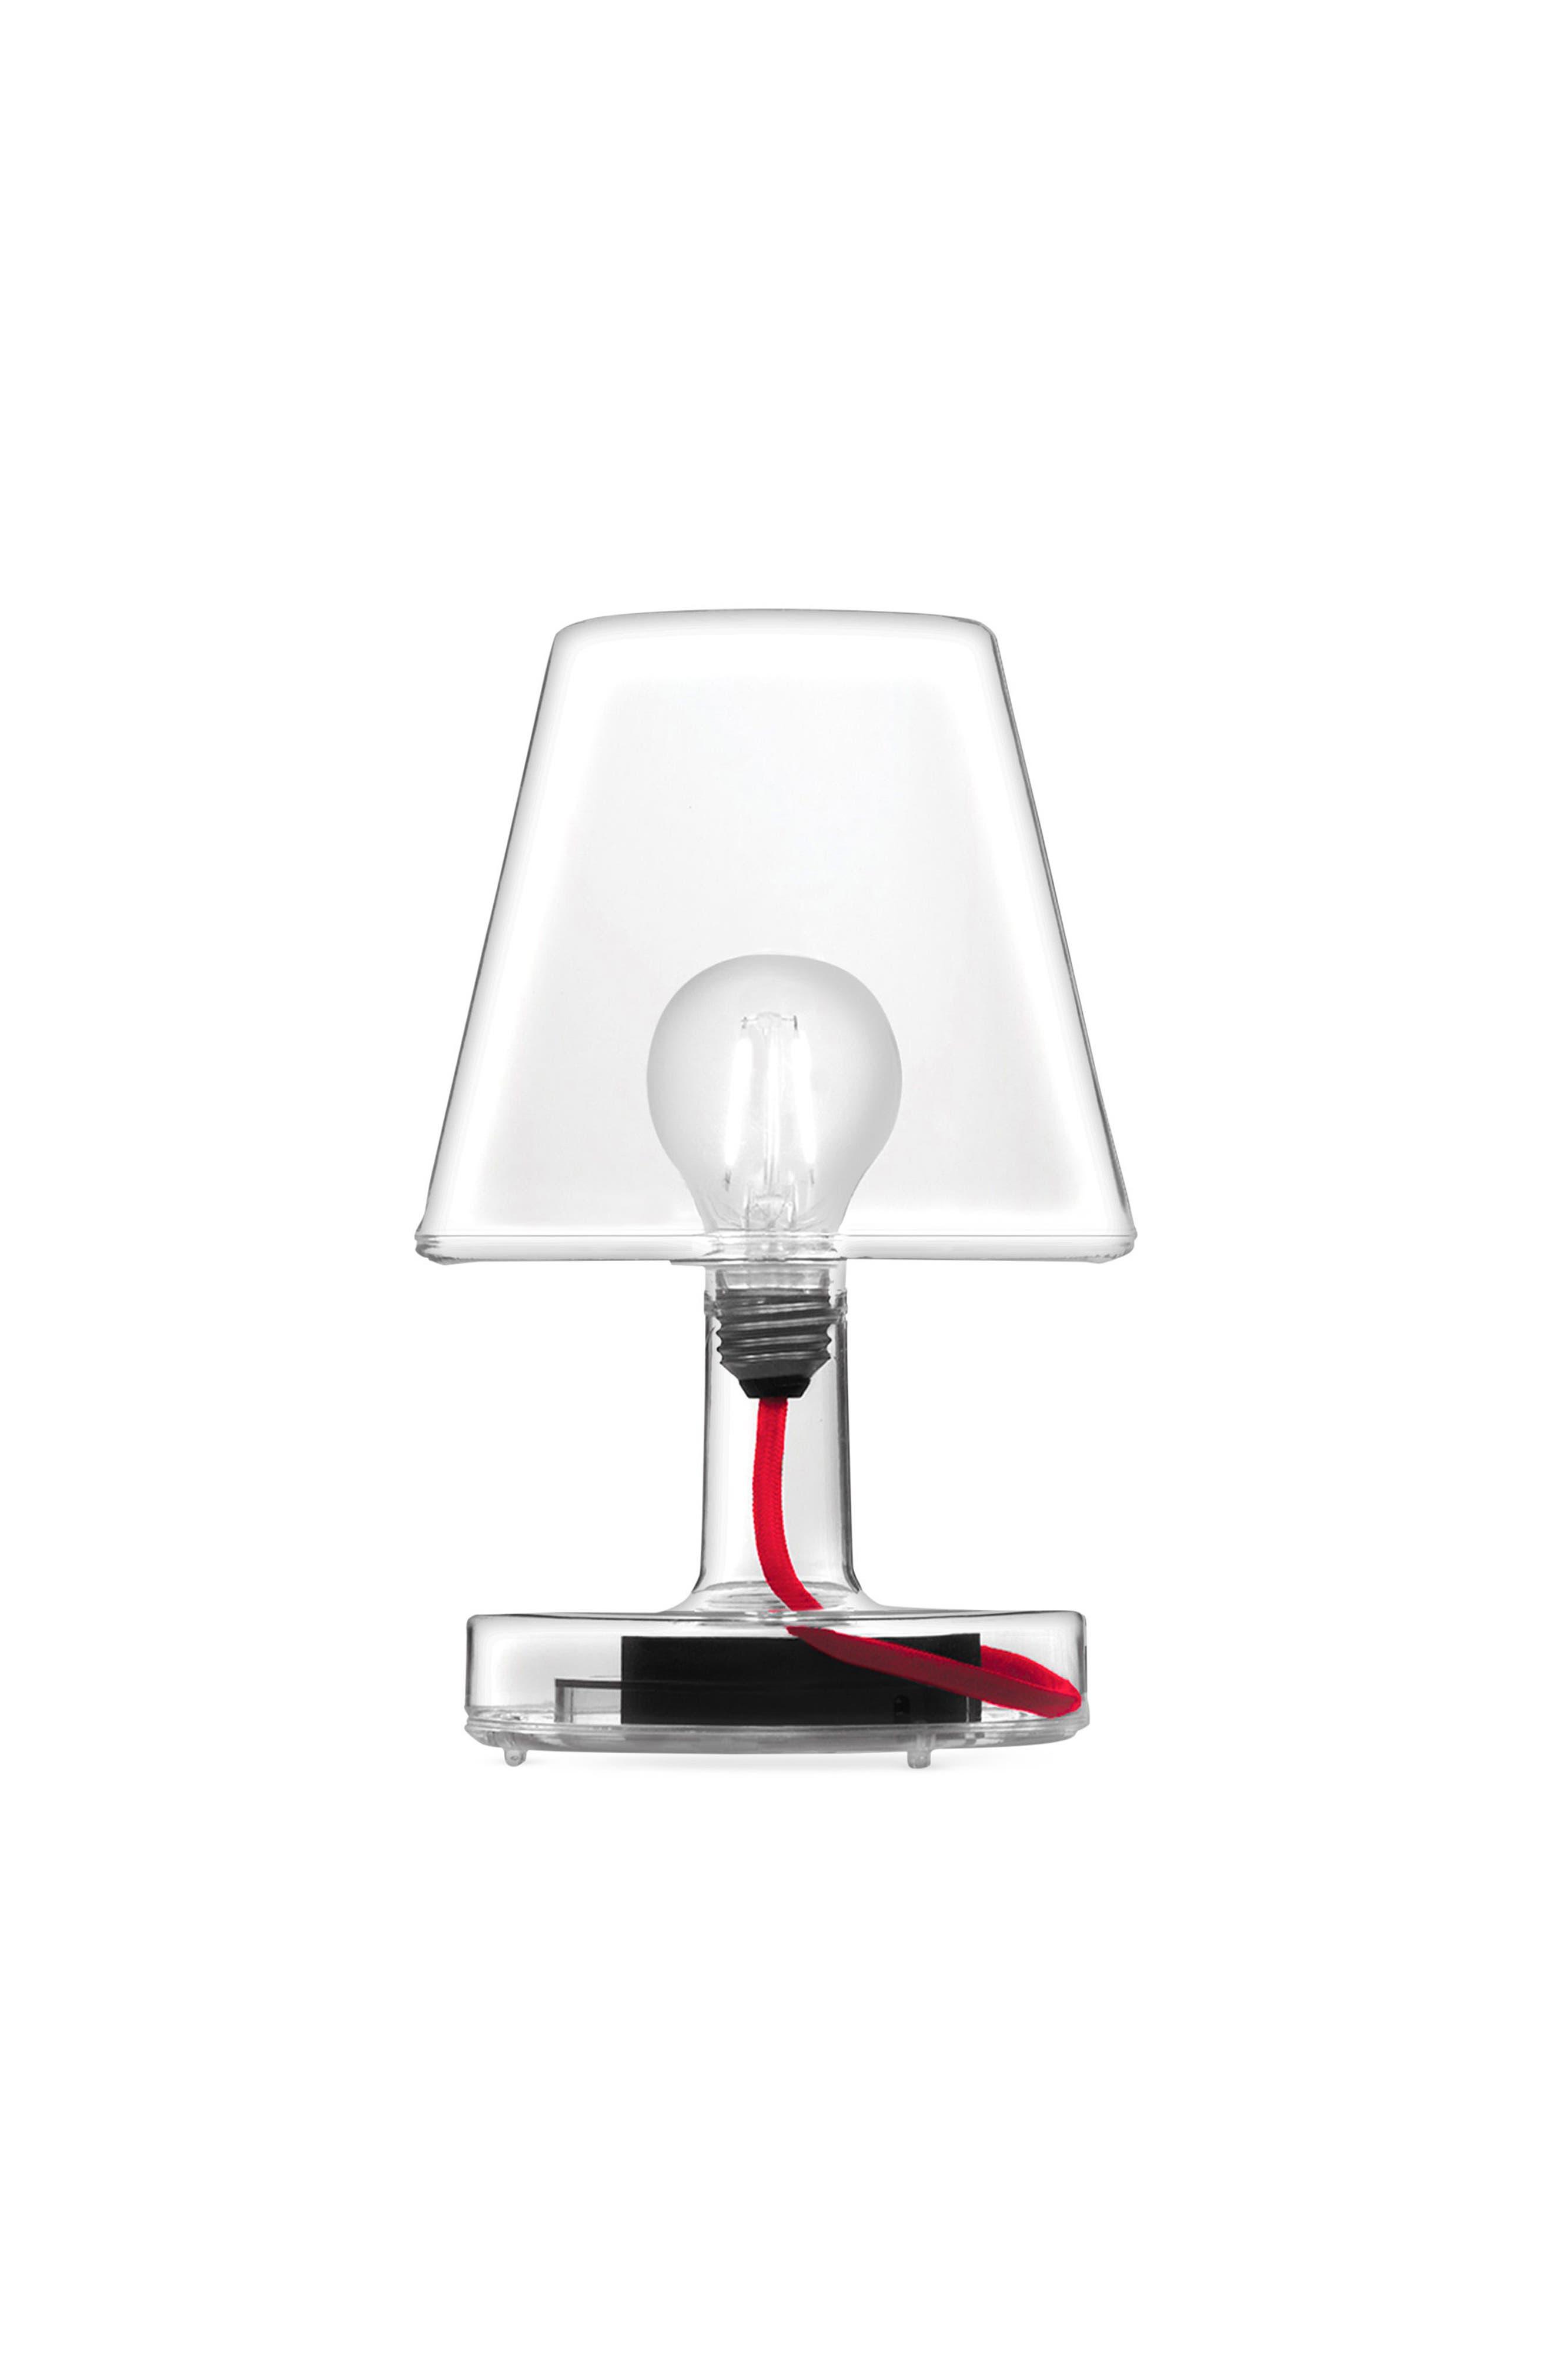 MoMA Design Store Transloetje Lamp